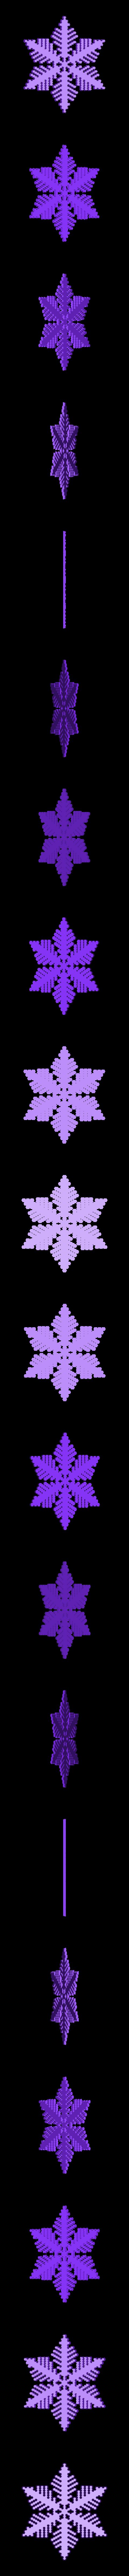 reiter-var6.stl Download free STL file Snowflake growth simulation in BlocksCAD • 3D printing design, arpruss